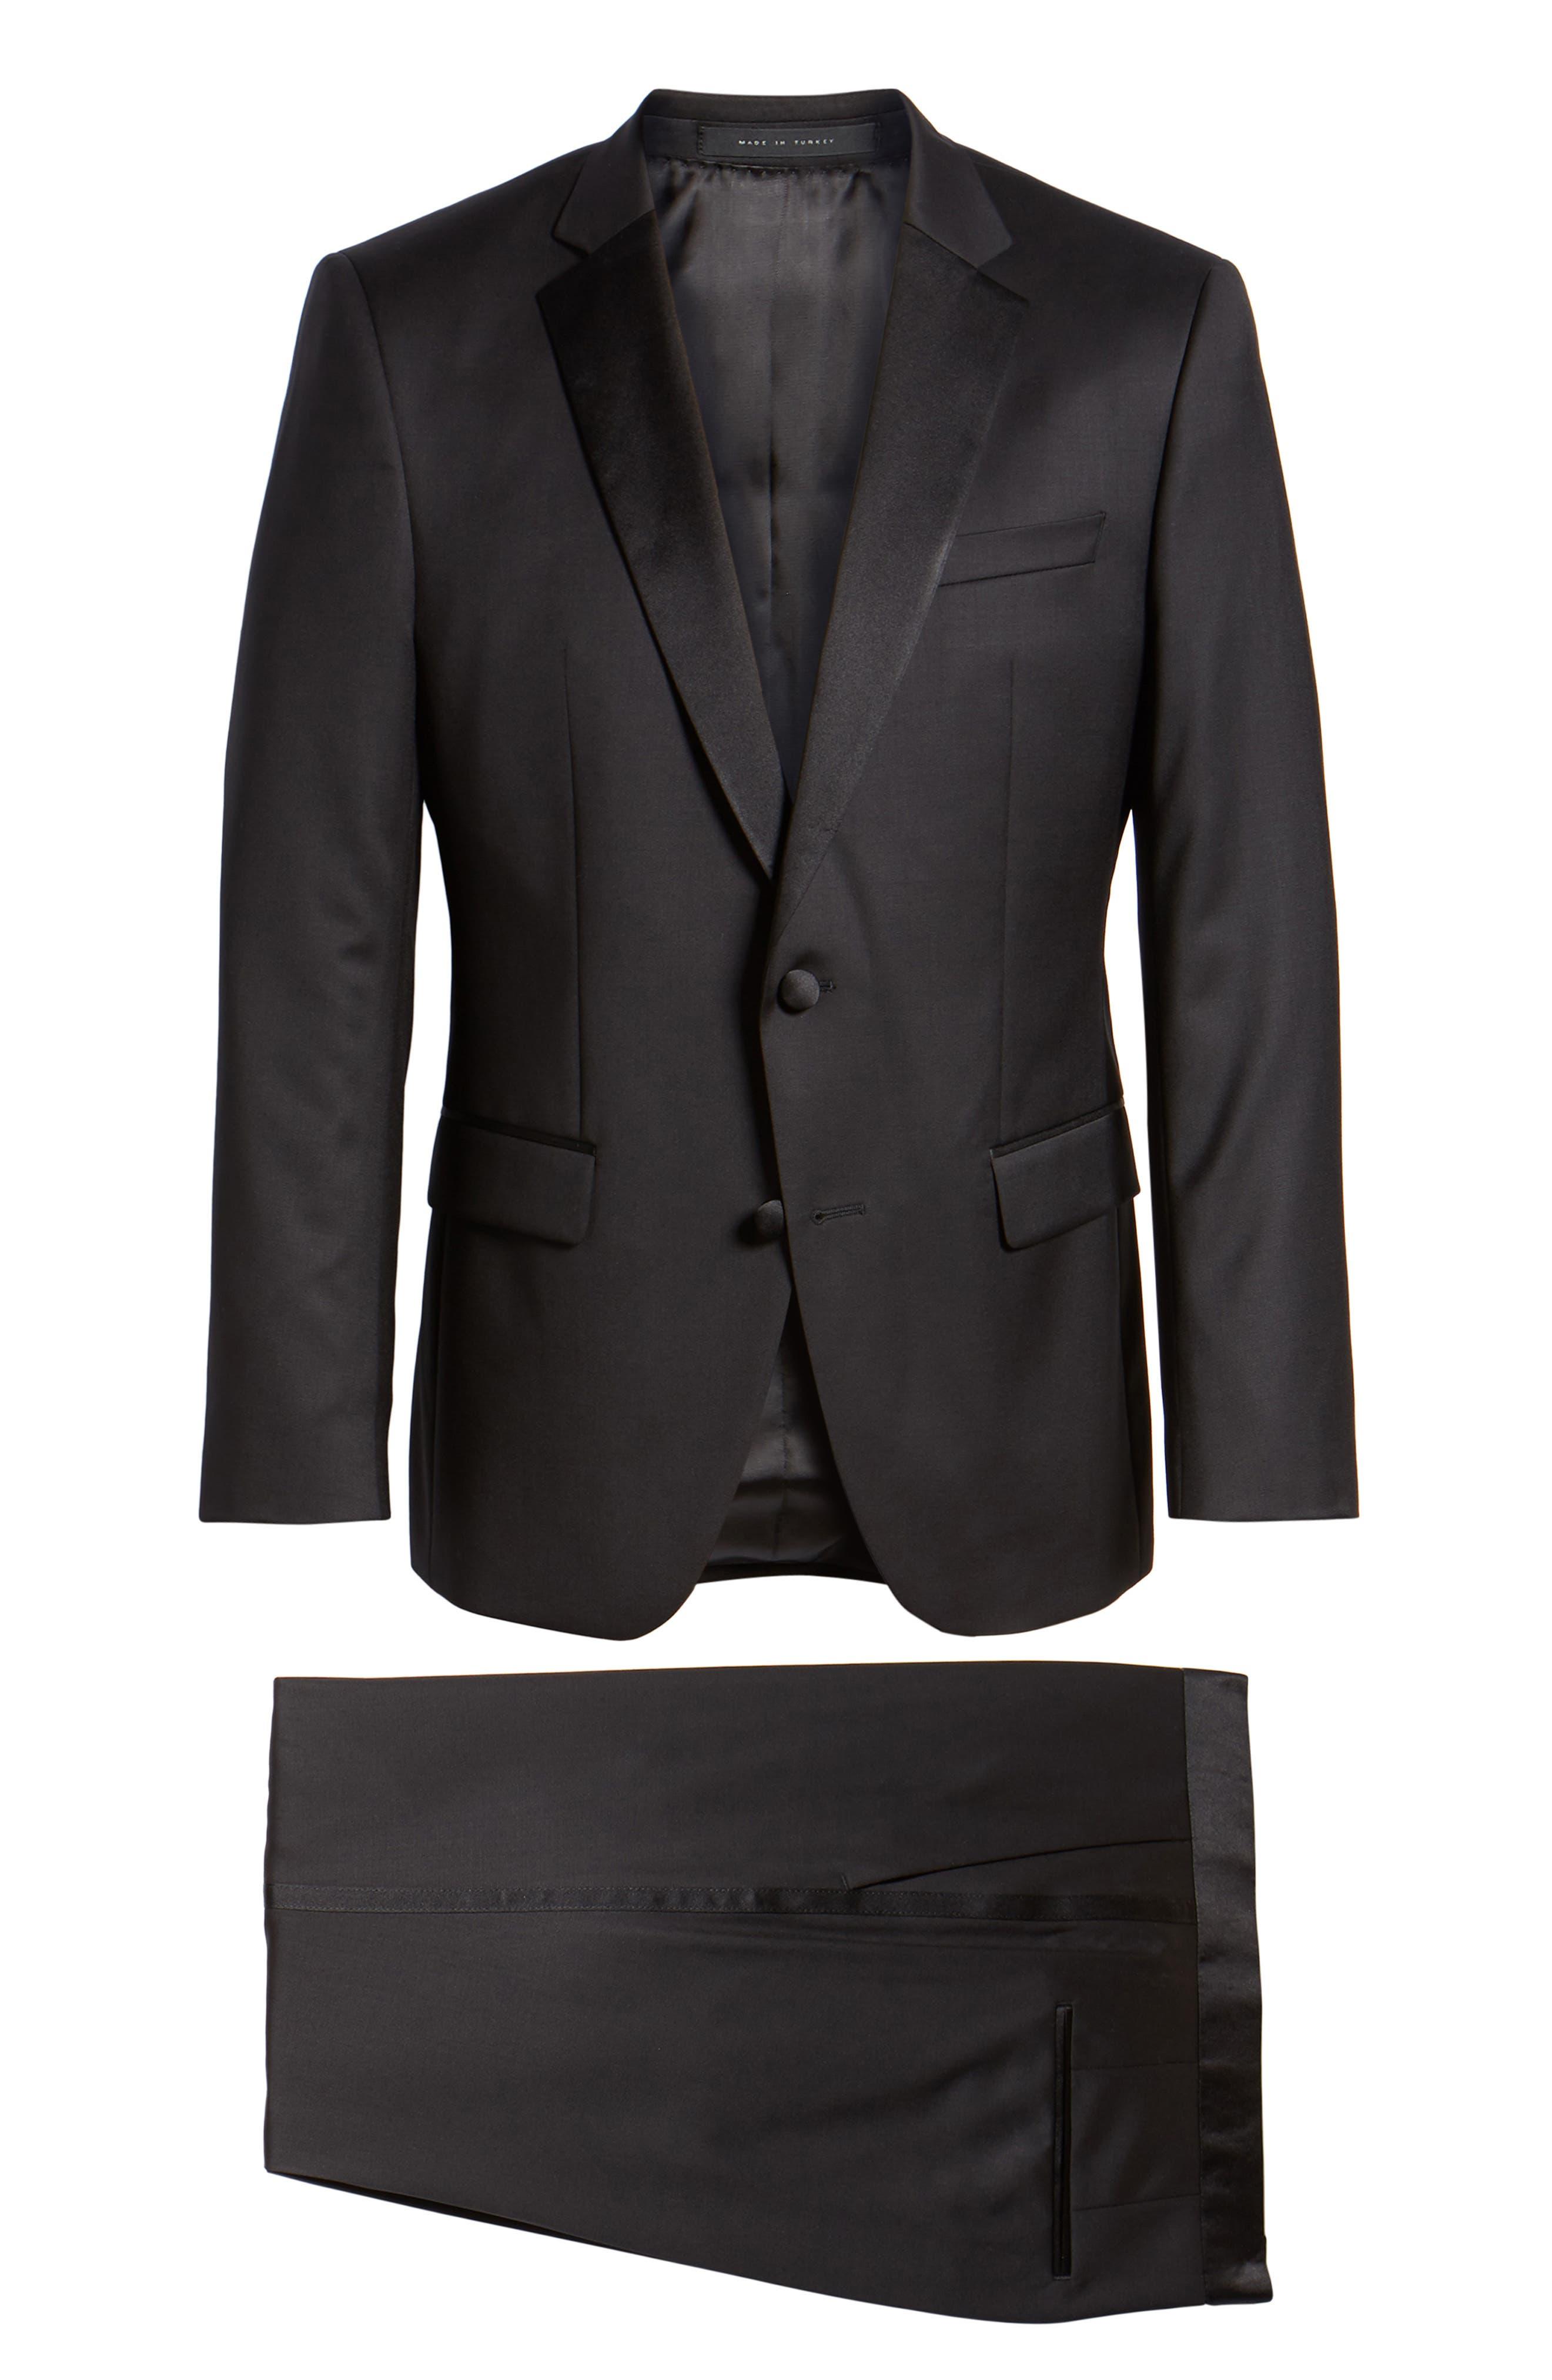 Halven/Gentry Trim Fit Wool Tuxedo,                             Alternate thumbnail 8, color,                             BLACK